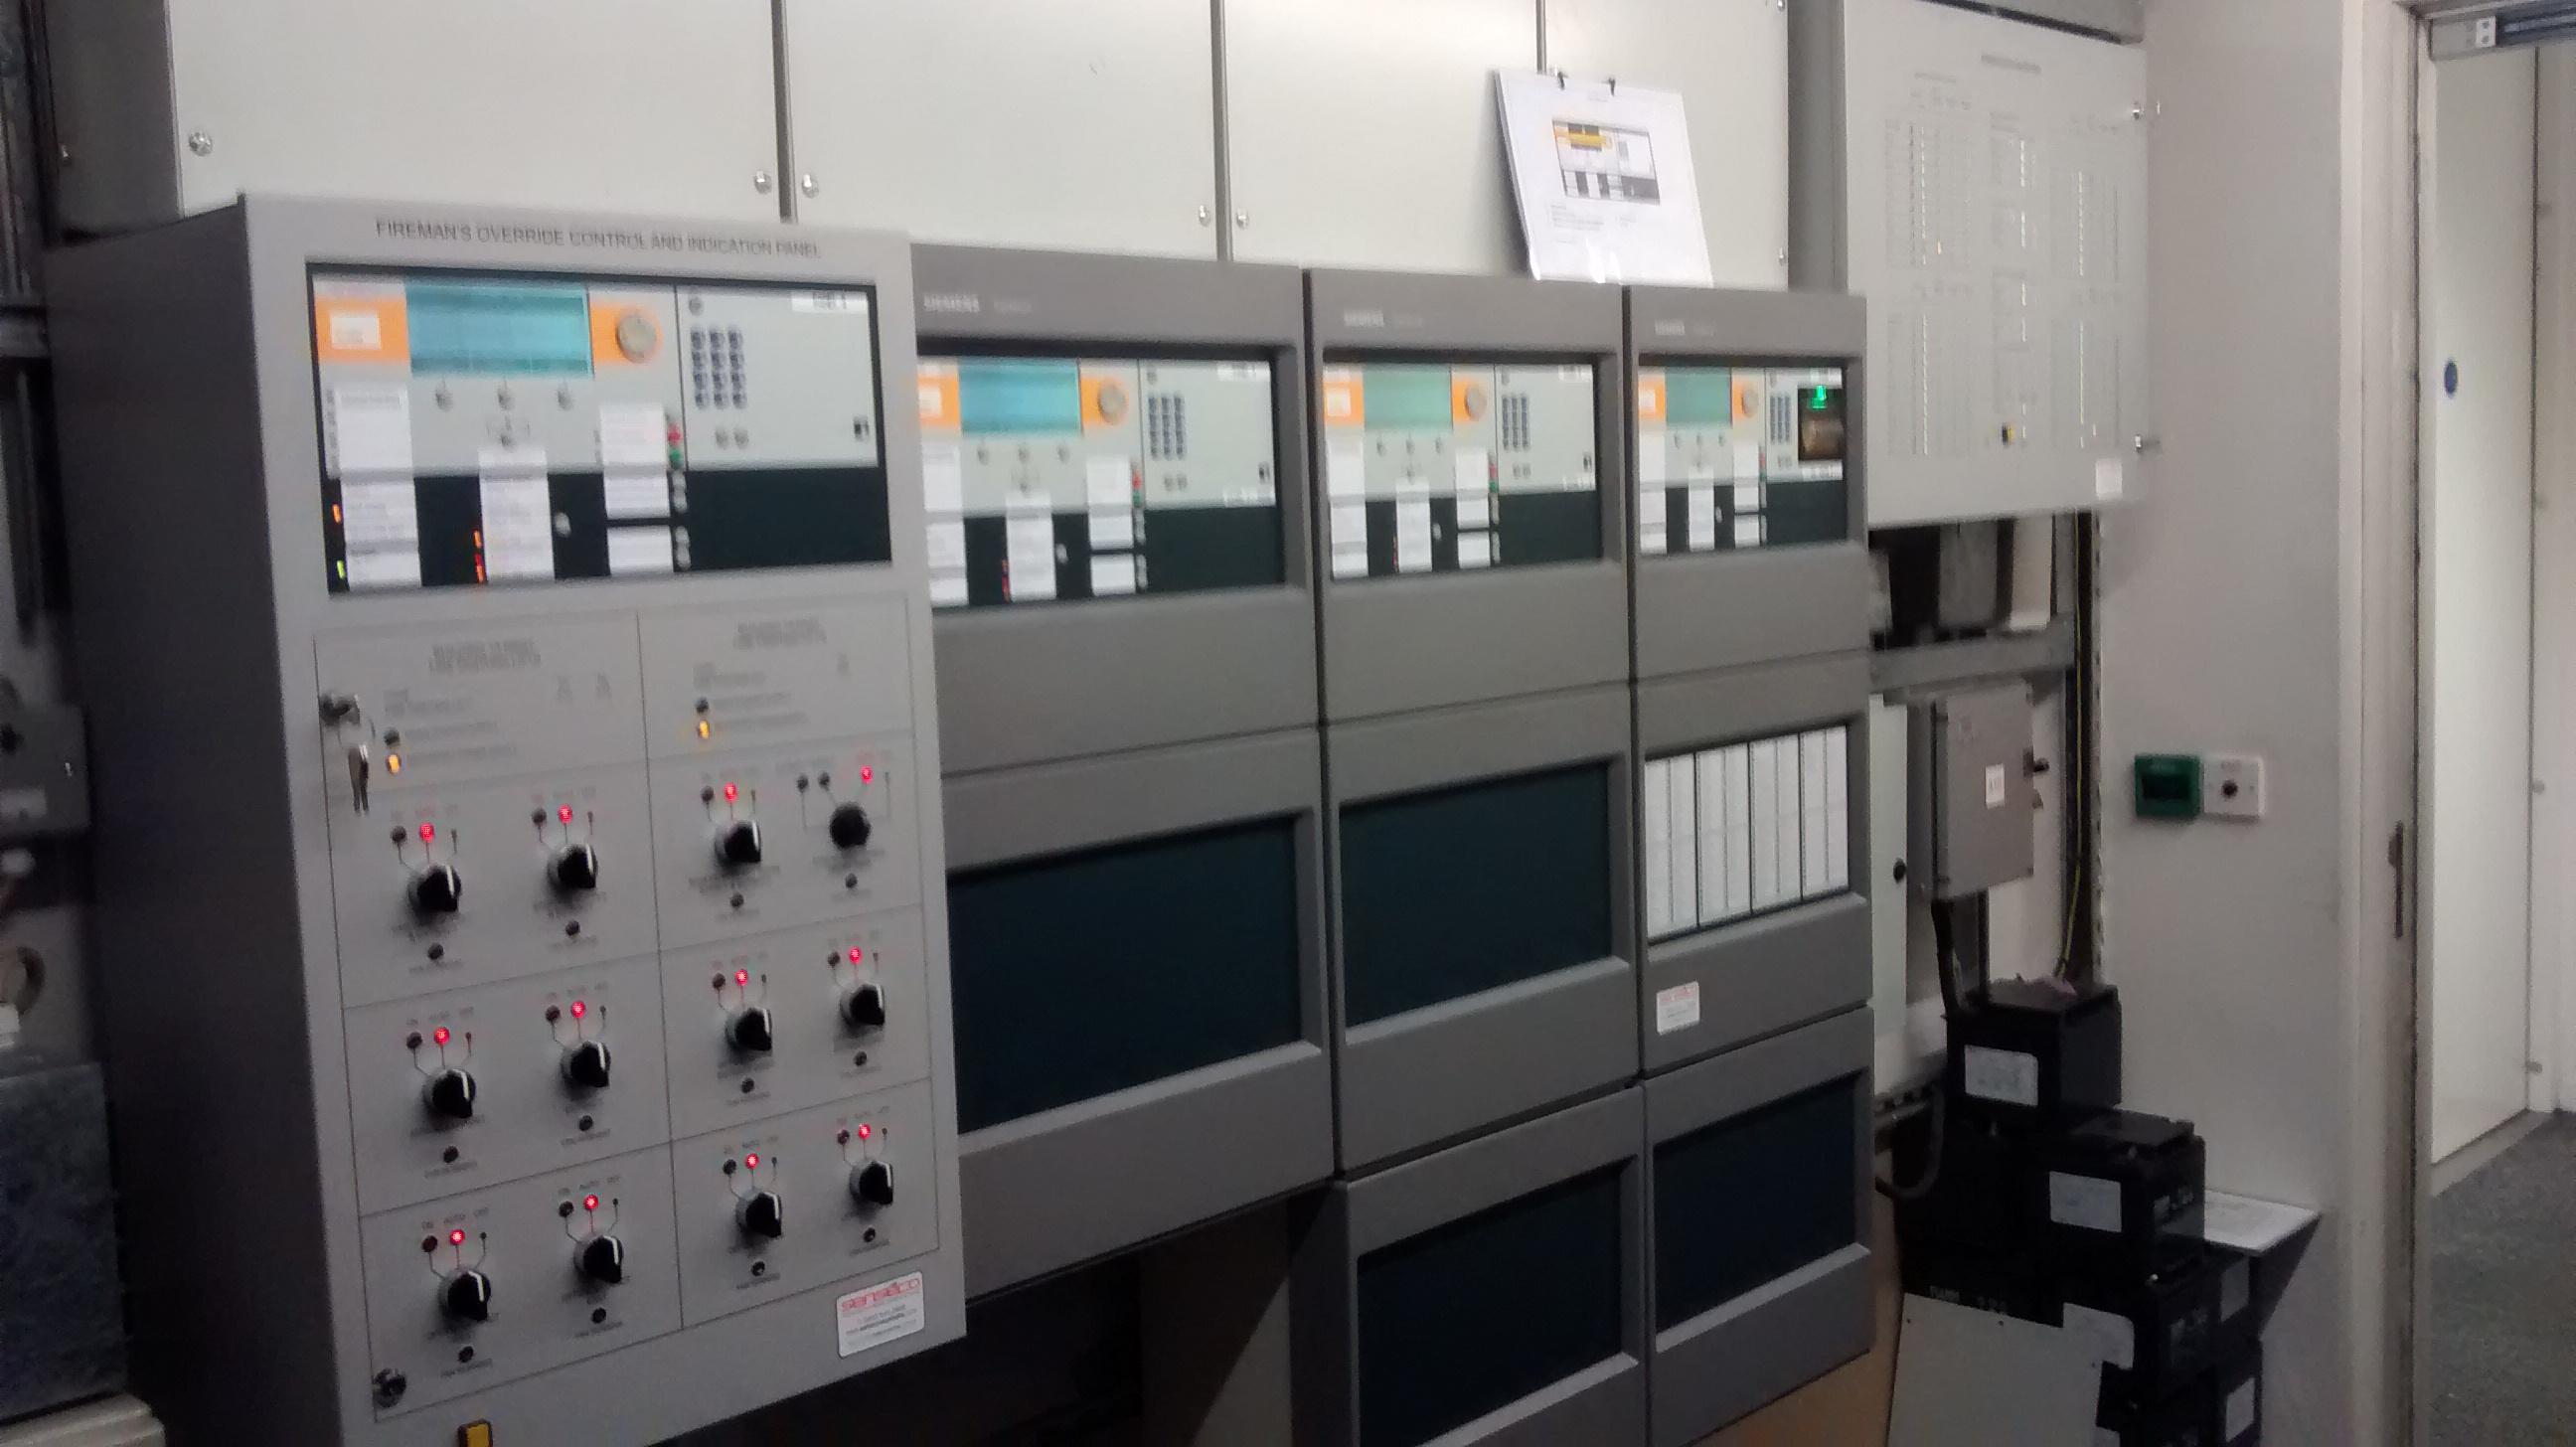 New Cerberus Pro System c/w Firemans Plant Panel, Sprinkler Panel